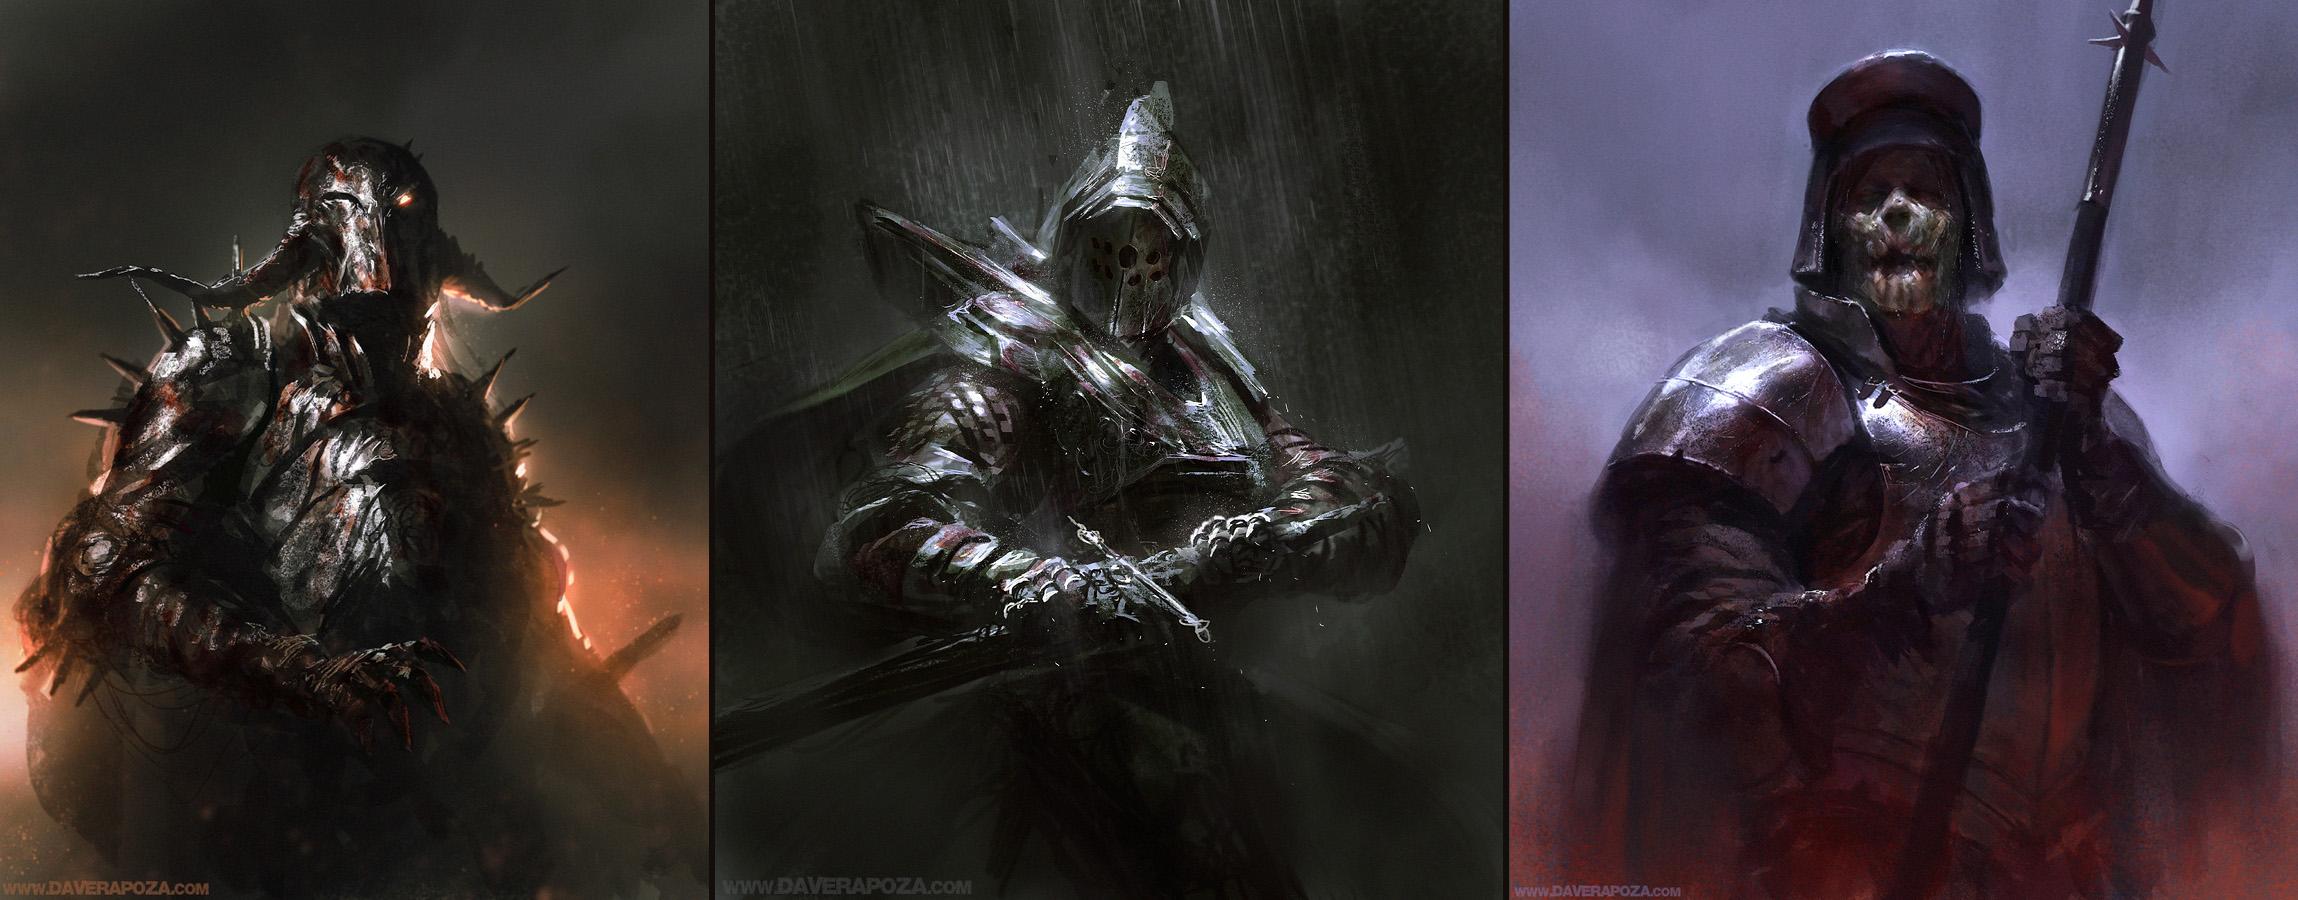 Dark Souls by DavidRapozaArt